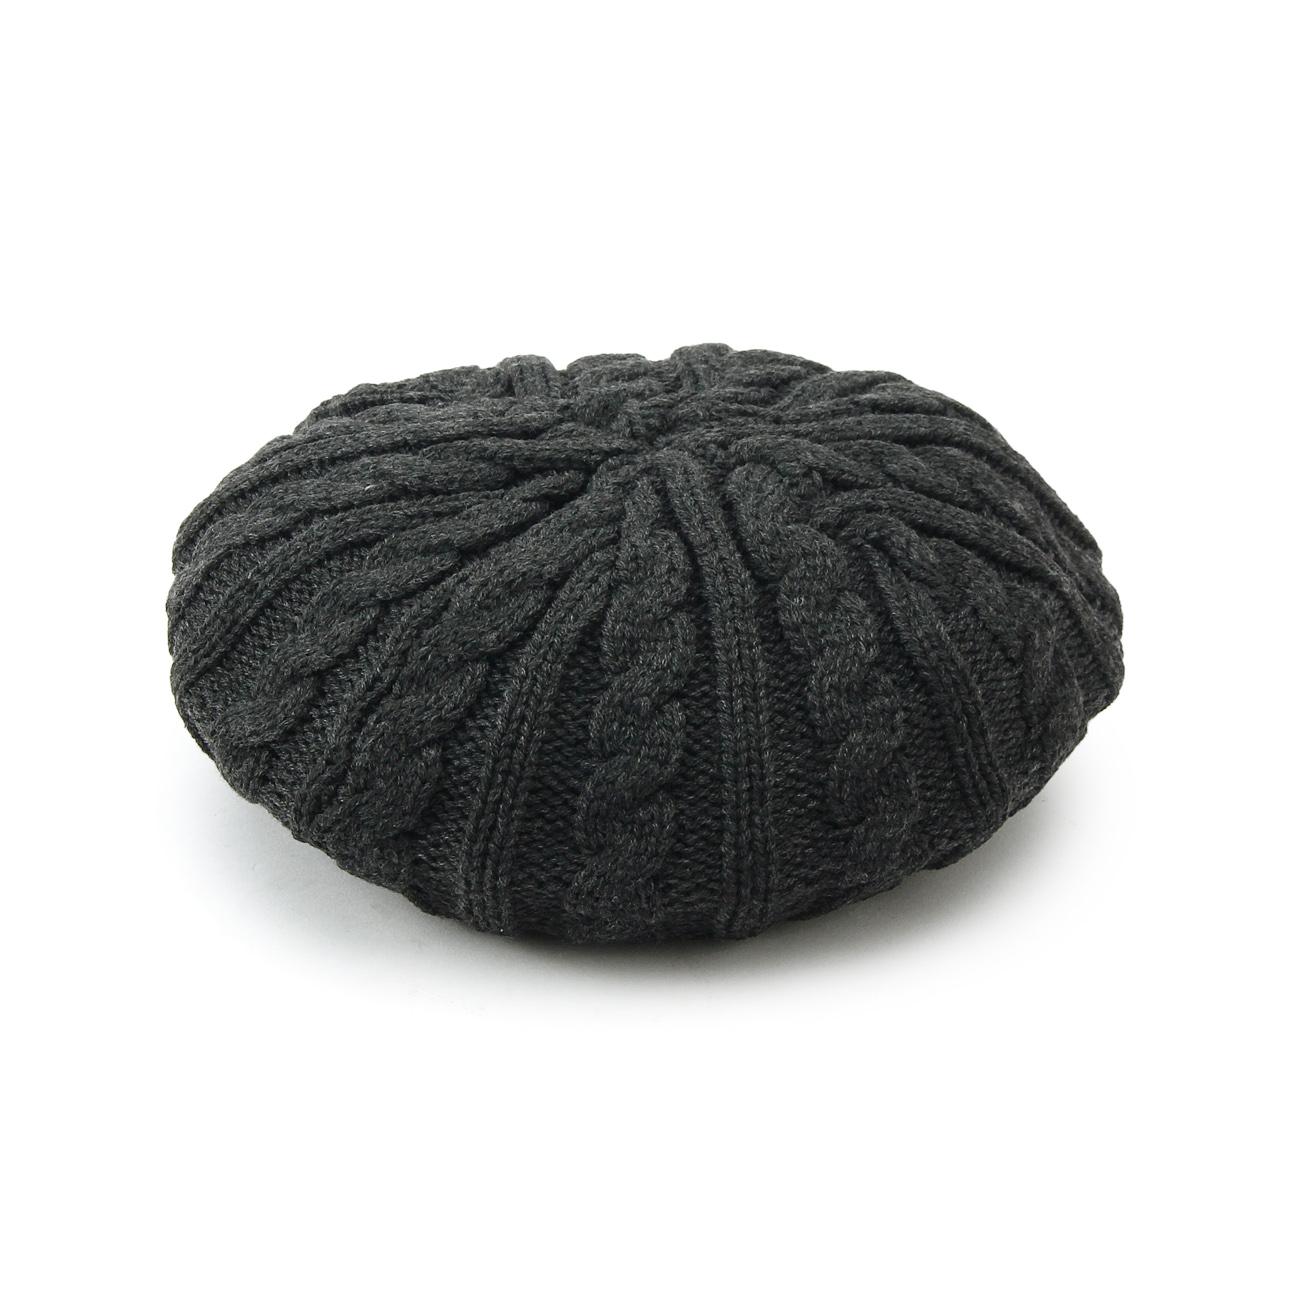 【OPAQUE.CLIP (オペークドットクリップ)】ケーブルニットベレー帽レディース 帽子 ハンチング・ベレー帽 グレー